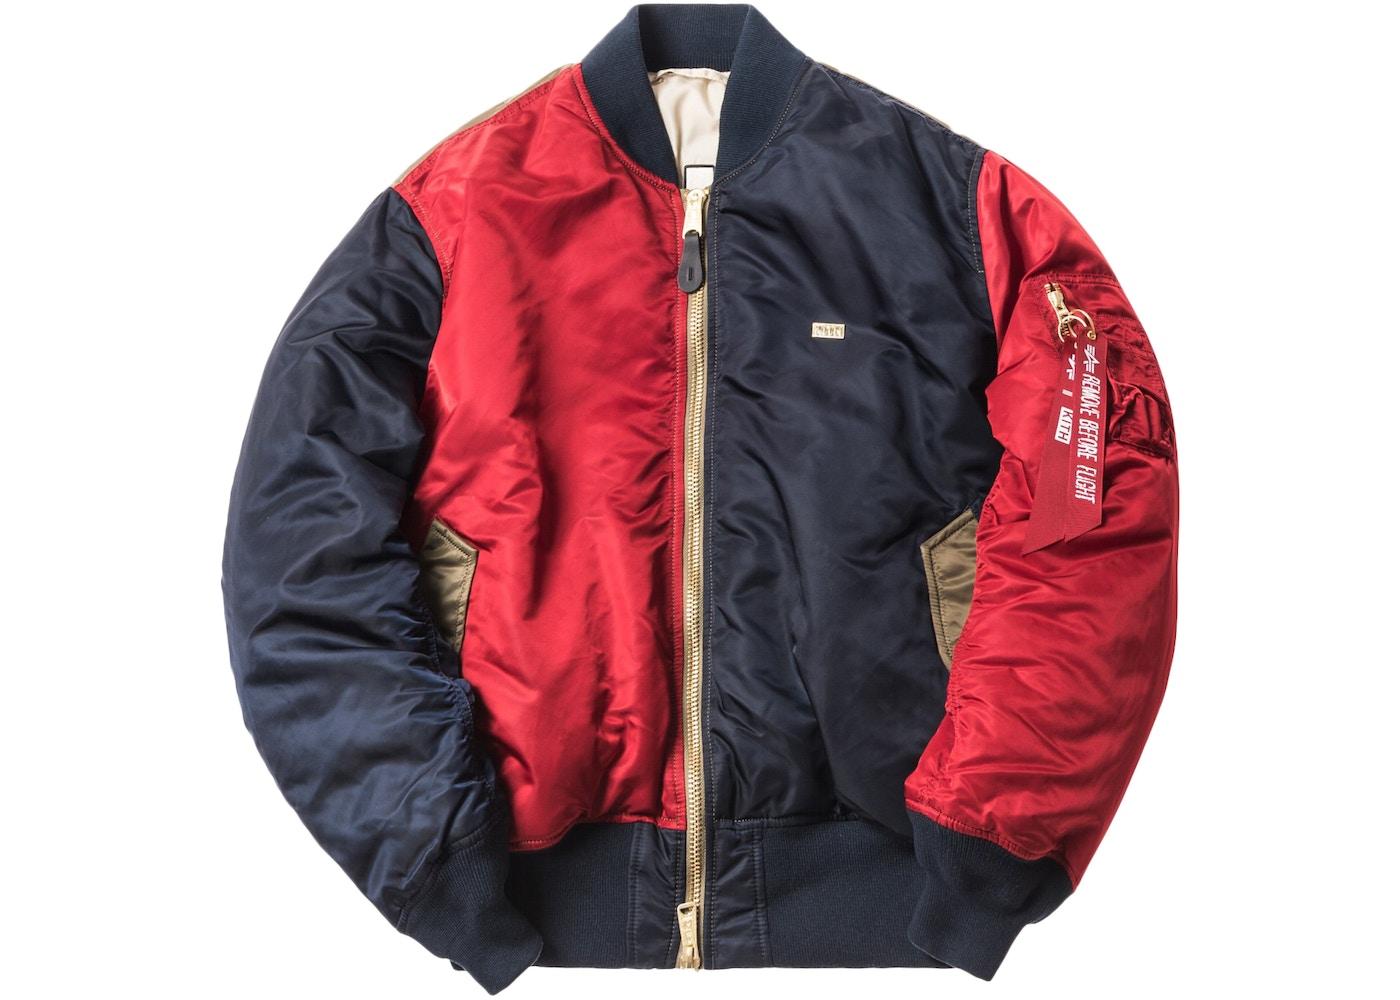 3b6bb6a72d940 Kith Jackets - Buy   Sell Streetwear